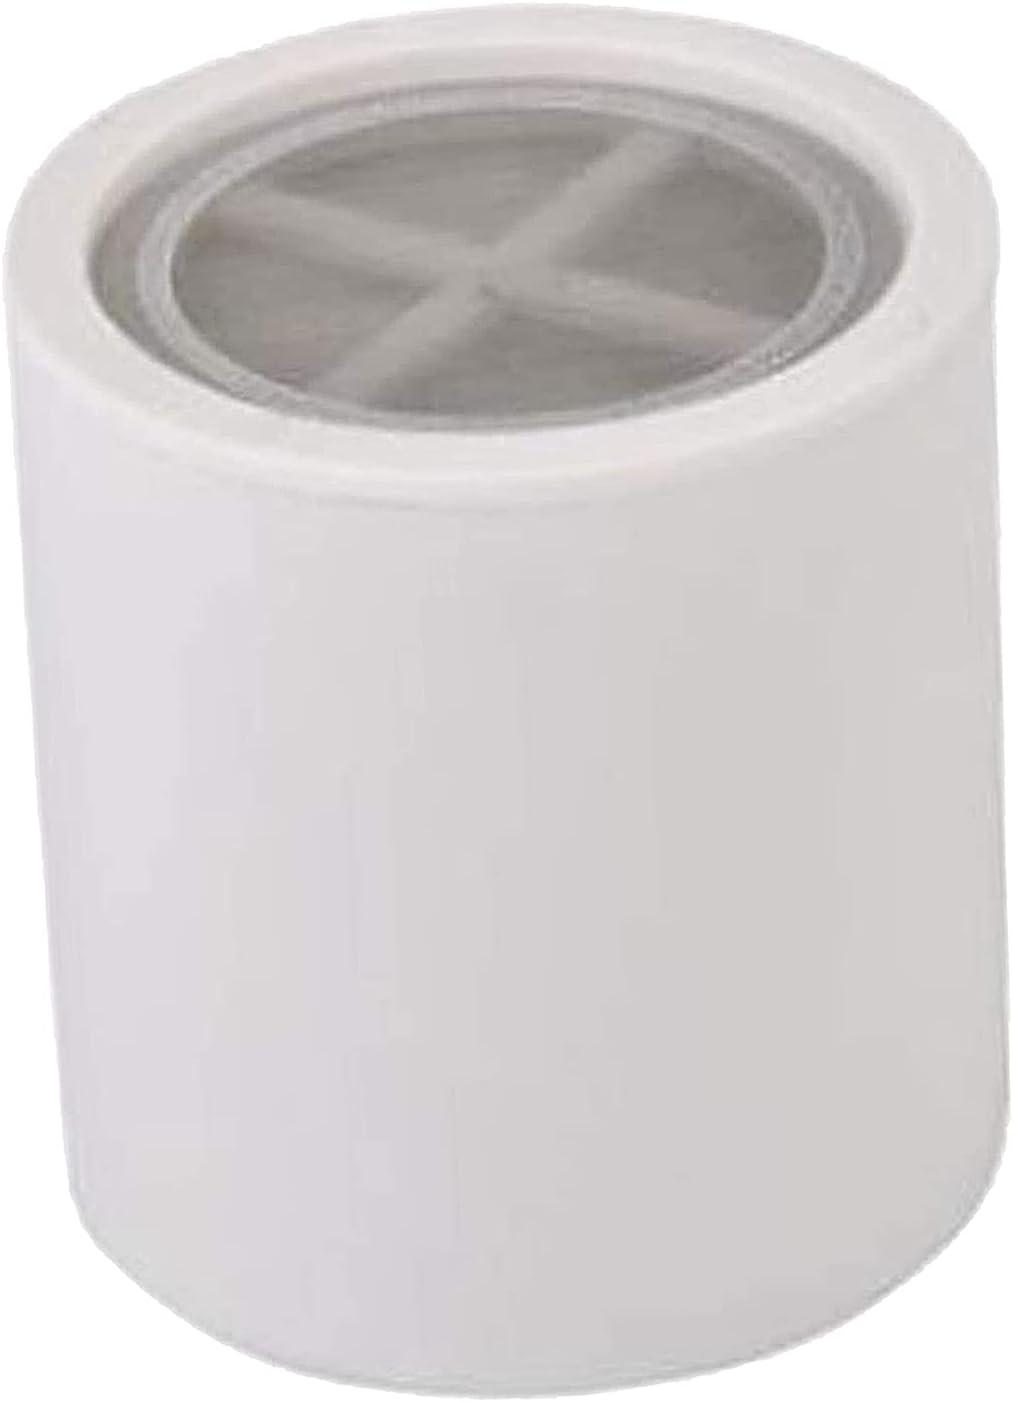 Gazechimp Multi-Stage Universal Shower Luxury goods Purchase Filter Ha Cartridge Water